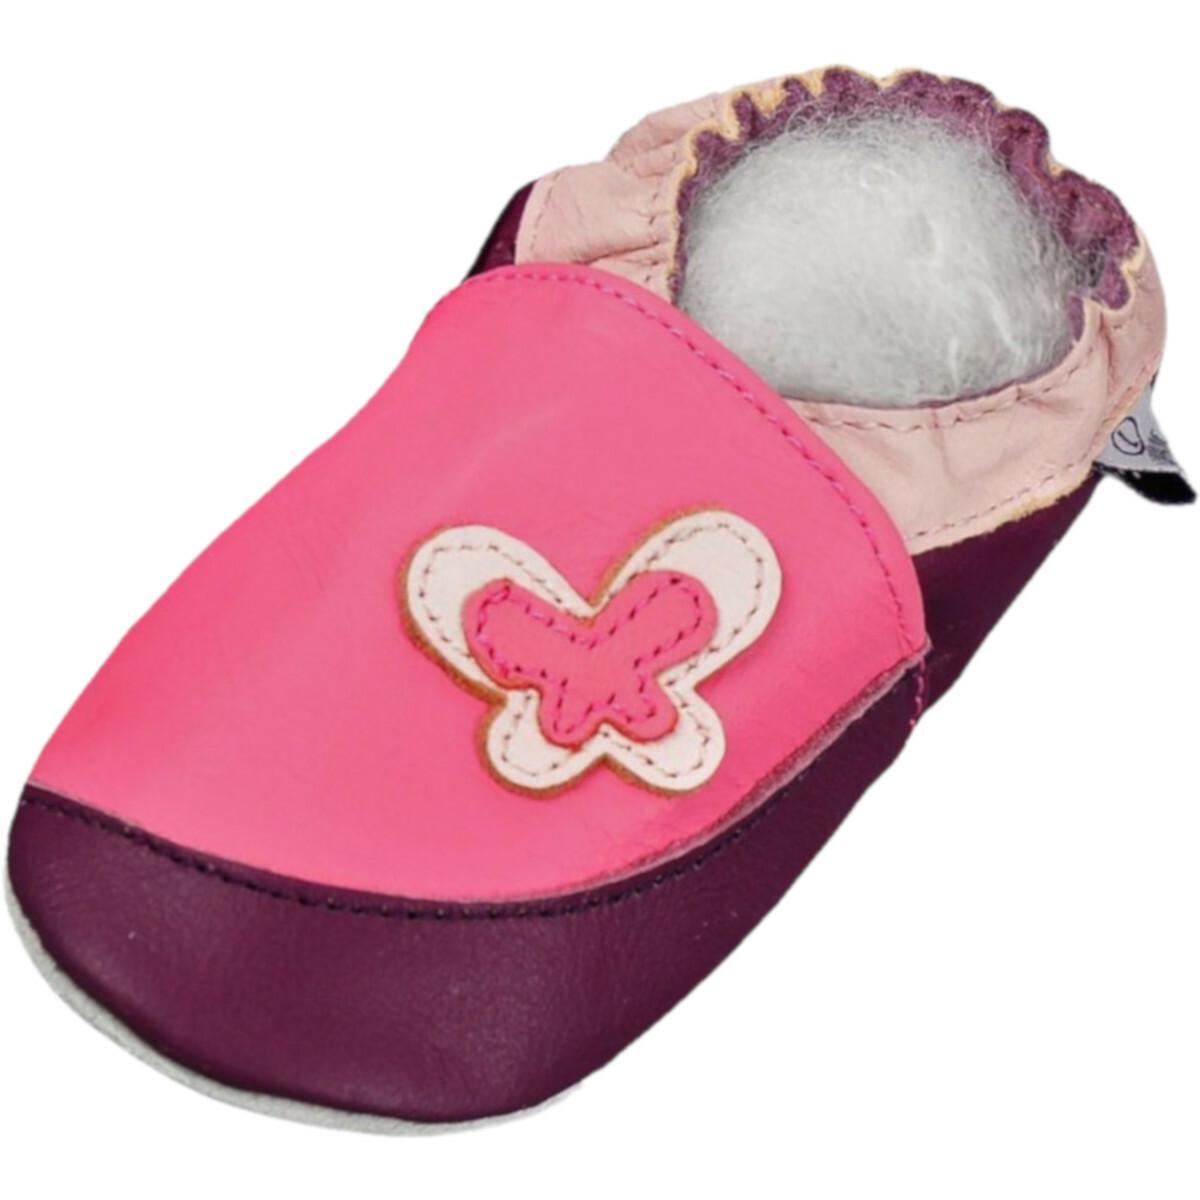 Kinder,Baby Schuhe,Krabbelschuhe,Lauflernschuhe,Lila,Rosa,Pink,Gr 22,23,24